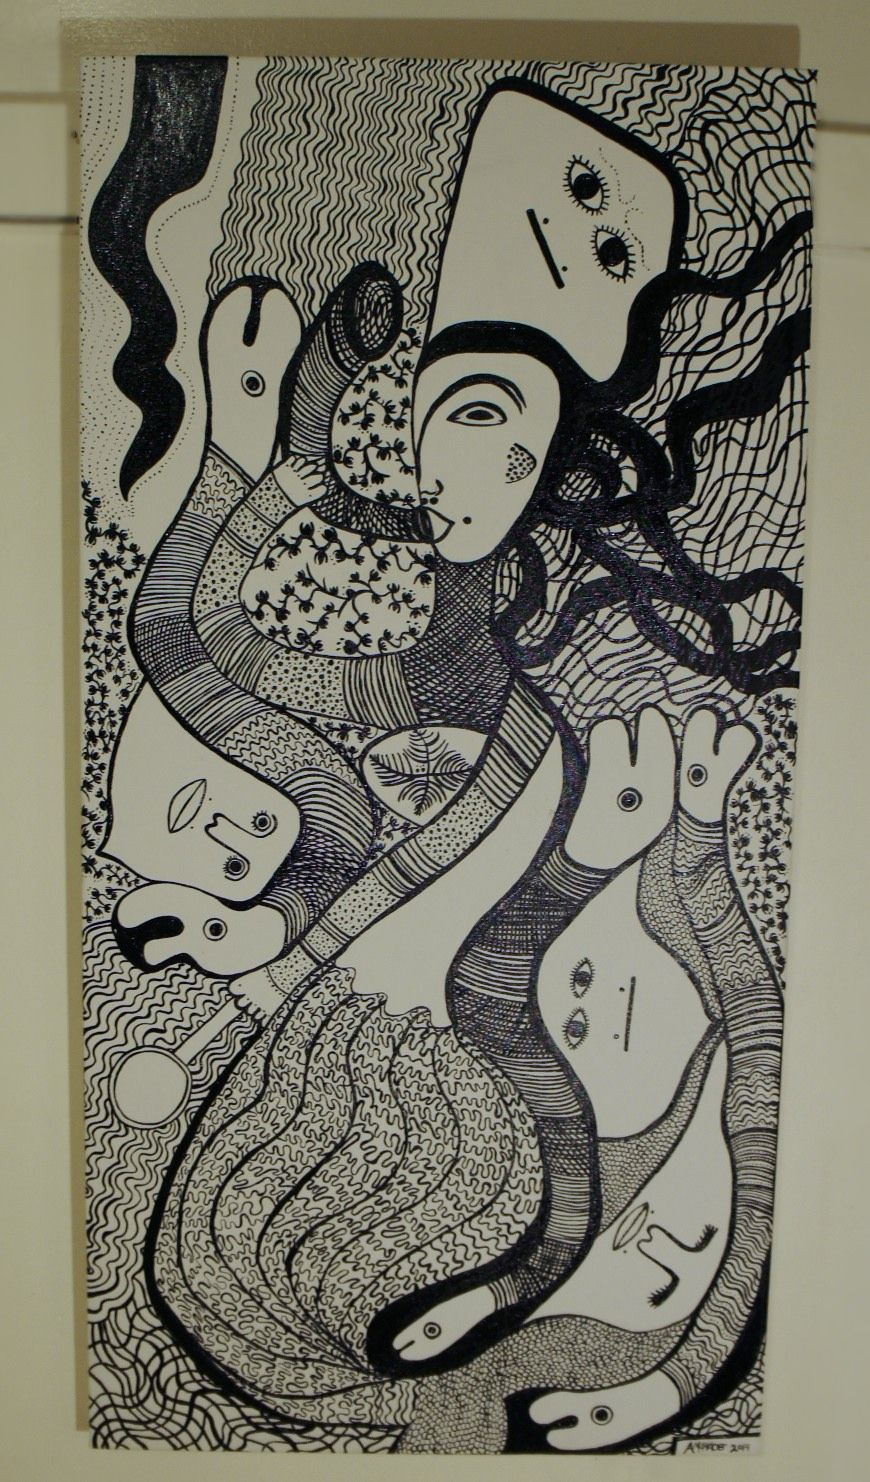 Mermaid   La Sirene Haitian-saint-soleil inspired art by Amanacer, 2014.